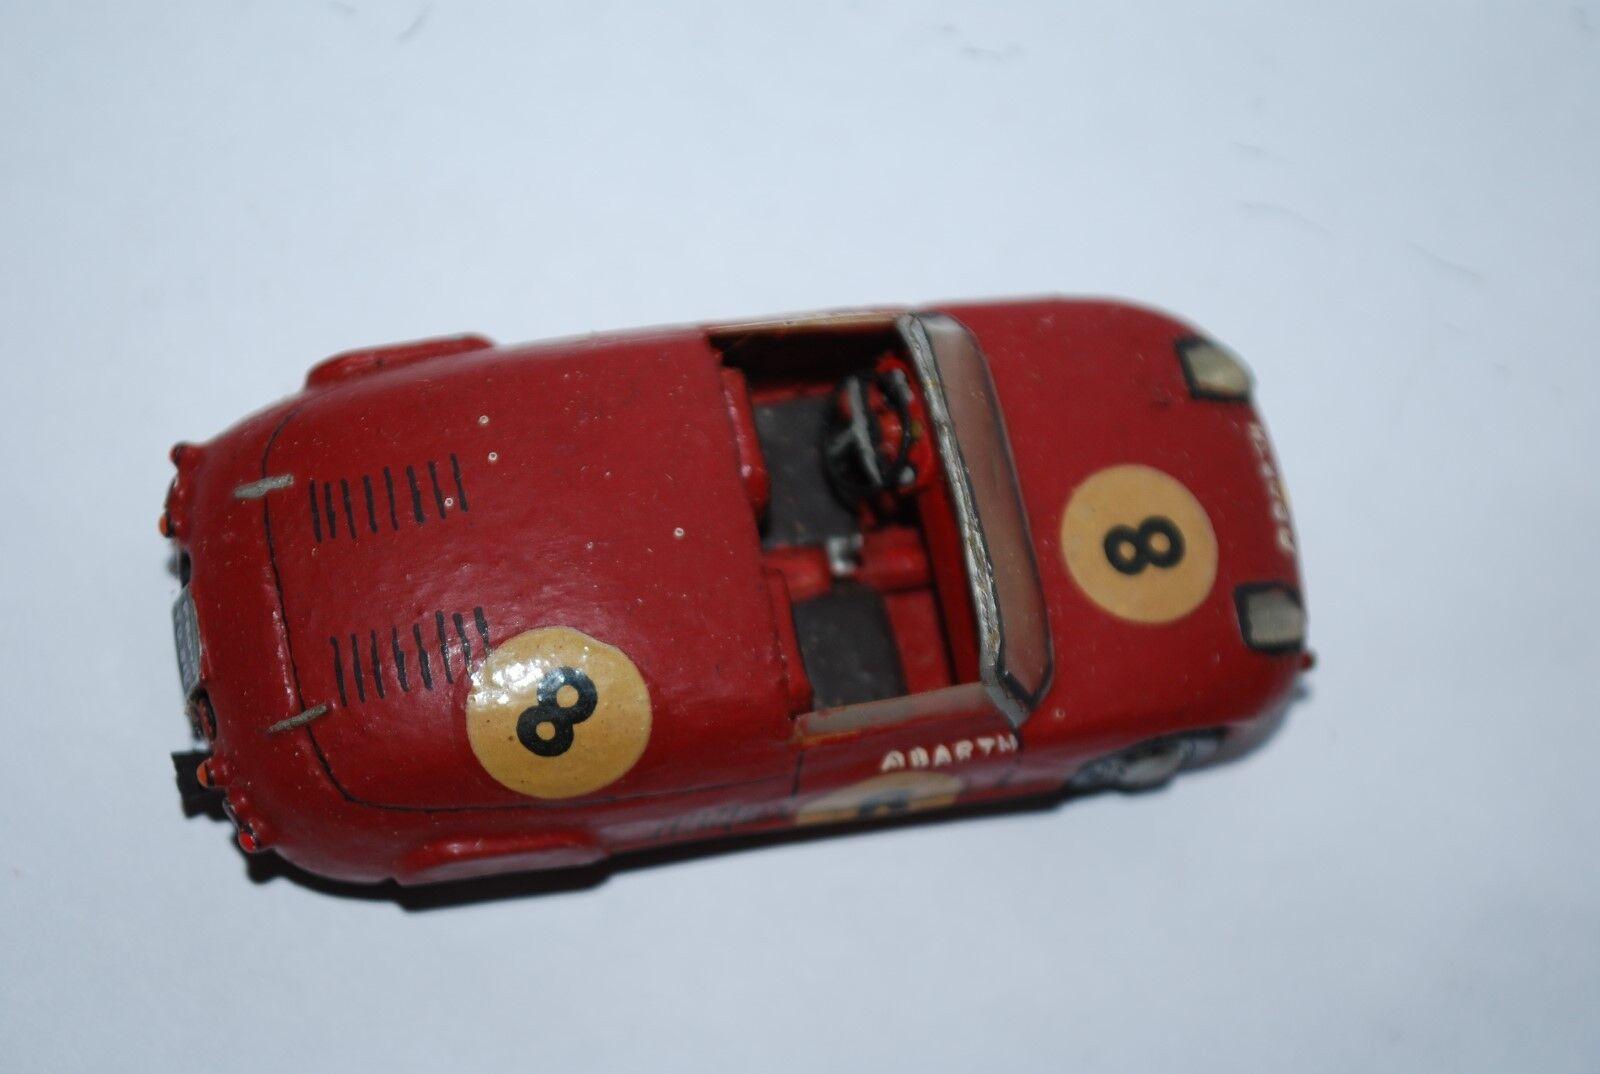 RD MARMANDE MARMANDE MARMANDE FIAT ABARTH 850 SPORT LE MANS 1961 SCALE 1 43 TRES RARE 2a7859